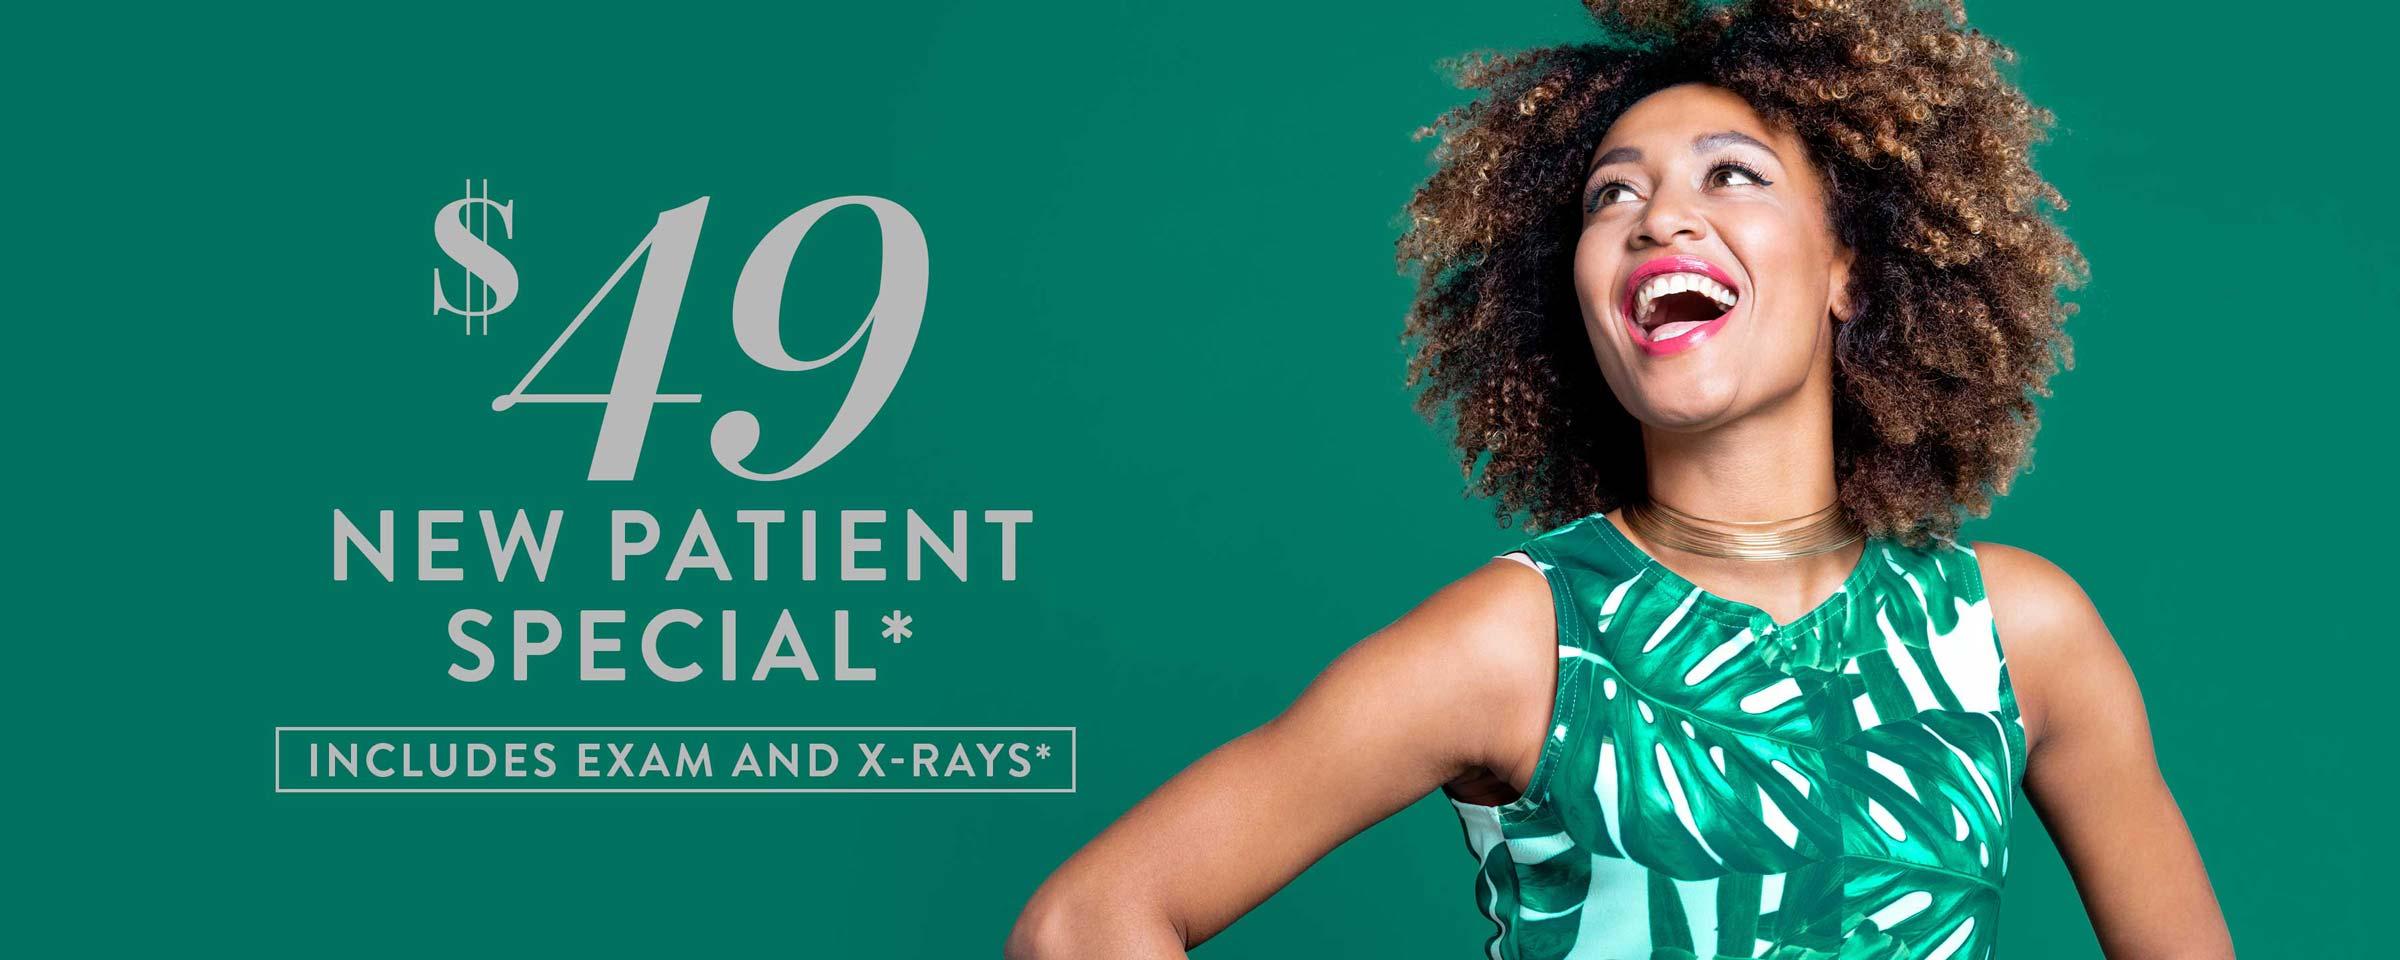 $49 New Patient Special*